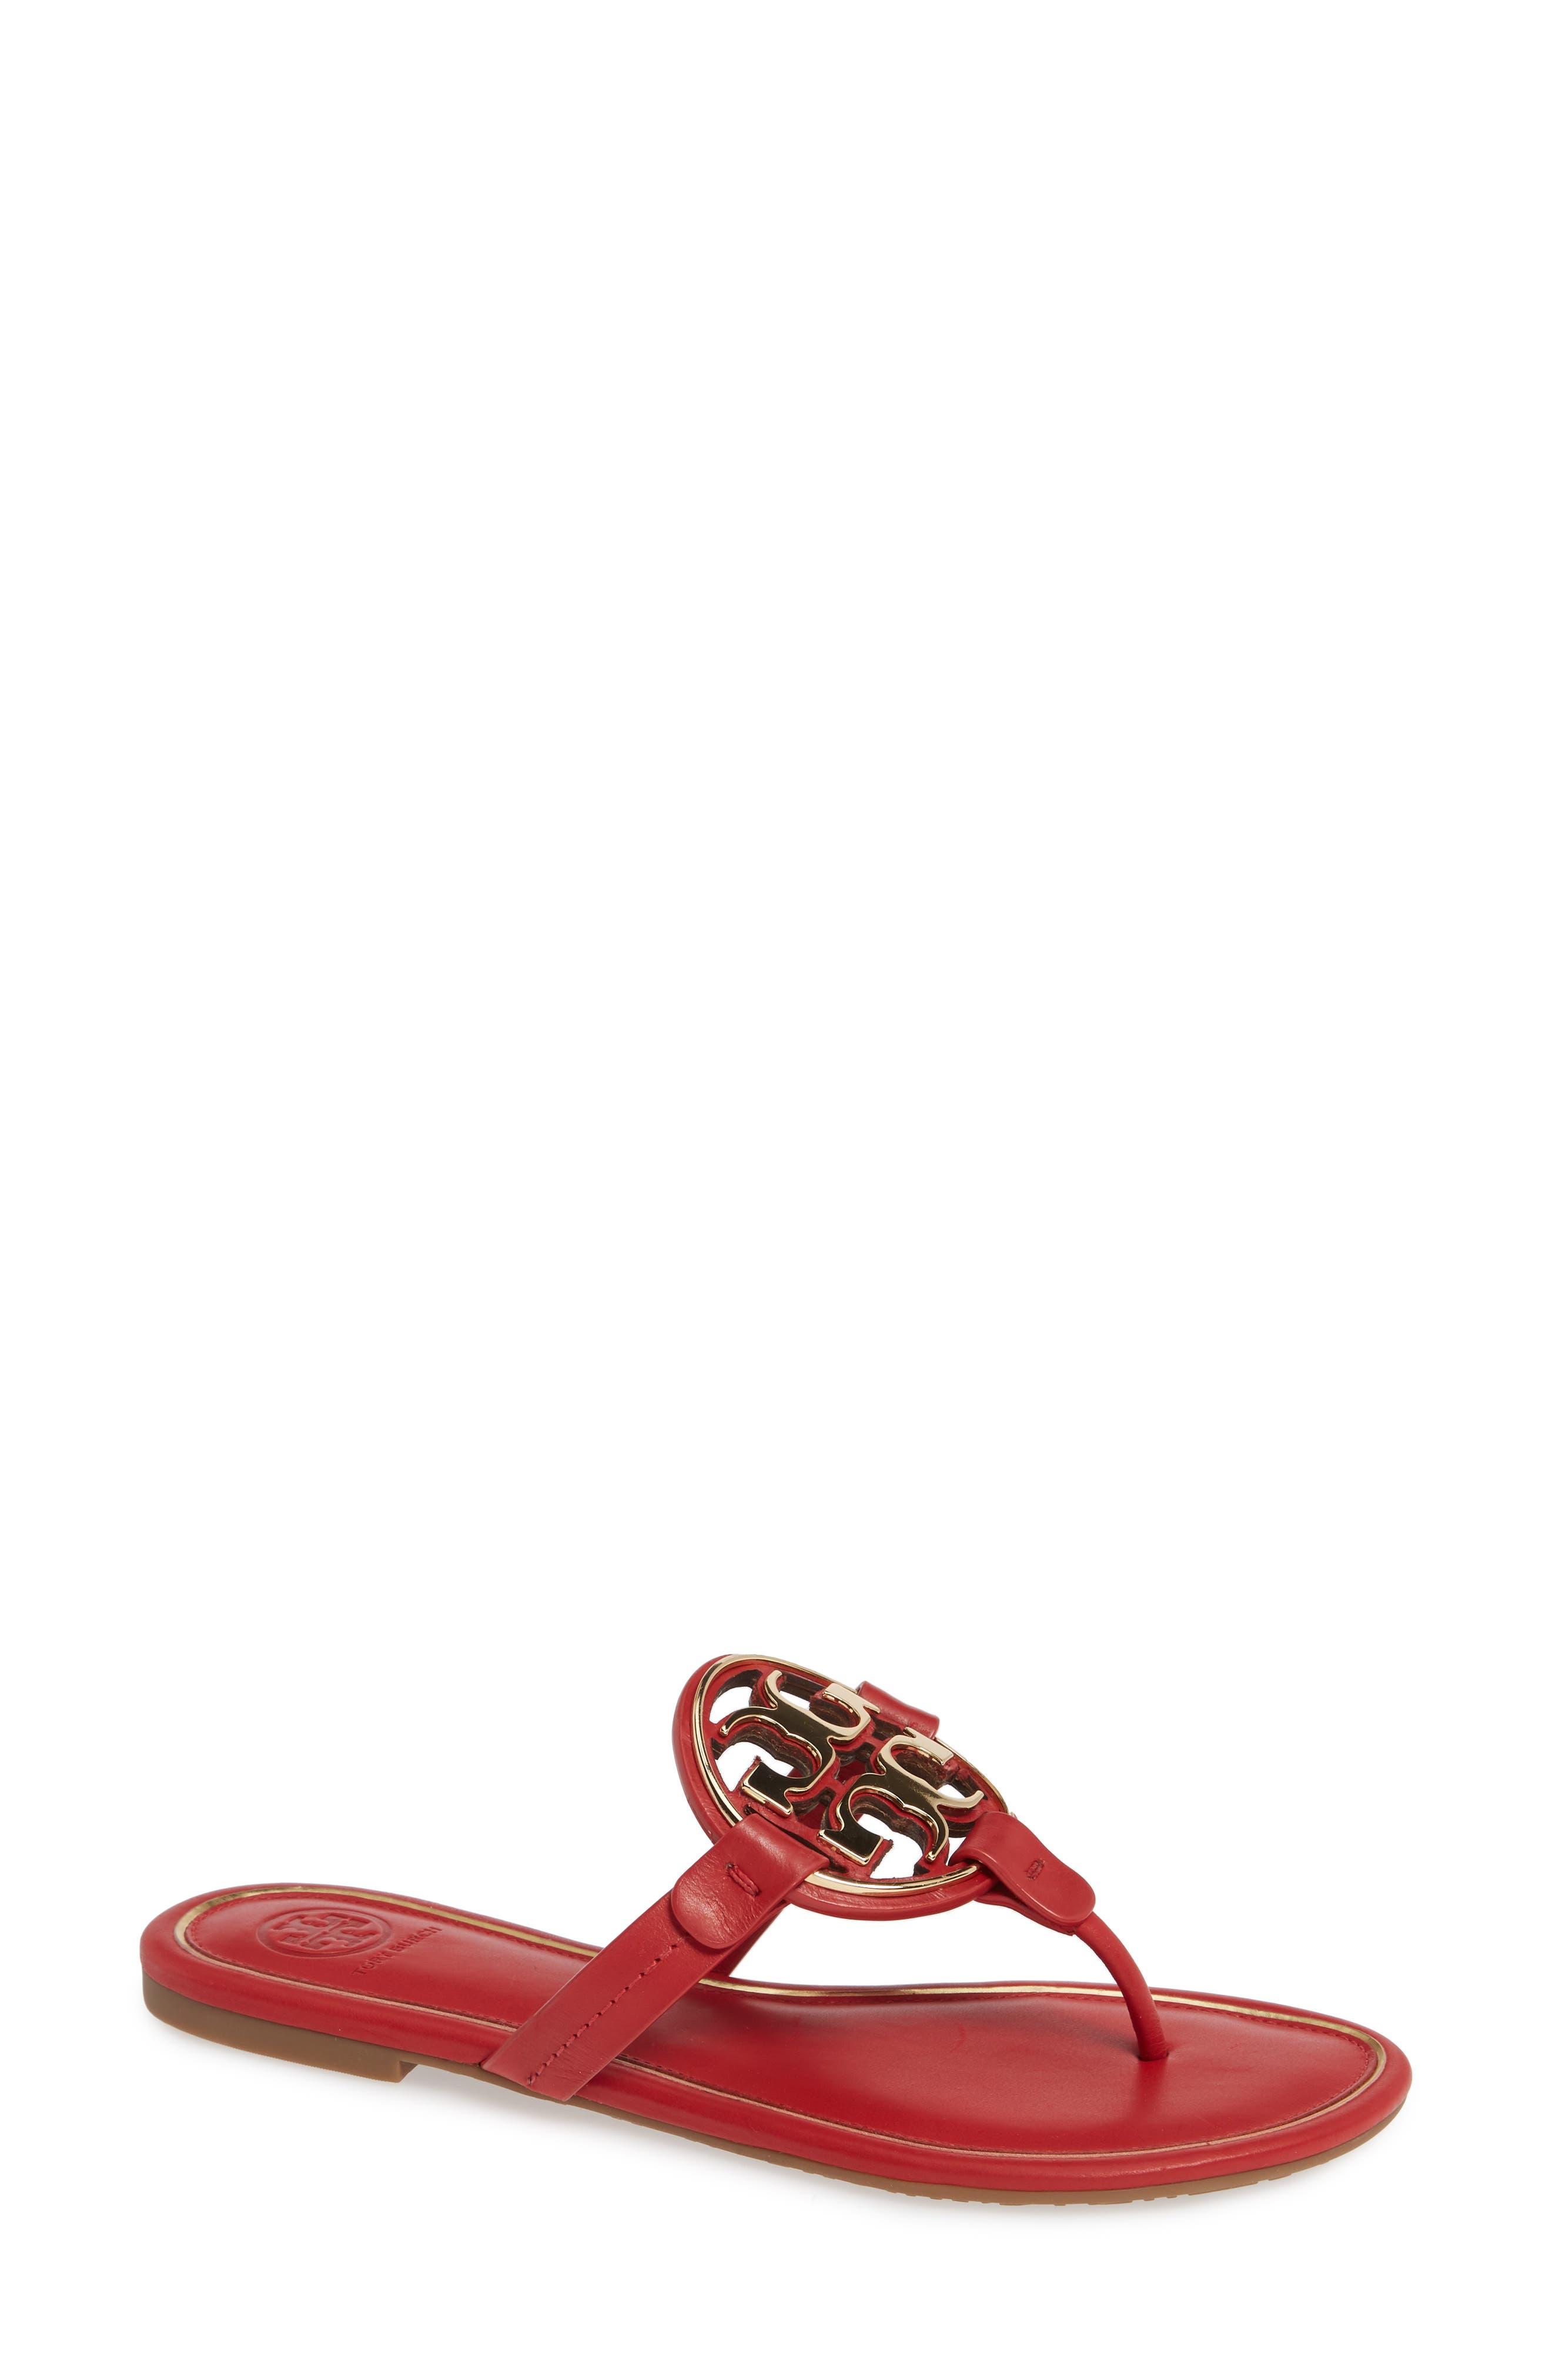 TORY BURCH Metal Miller Flip Flop, Main, color, BRILLIANT RED/ GOLD